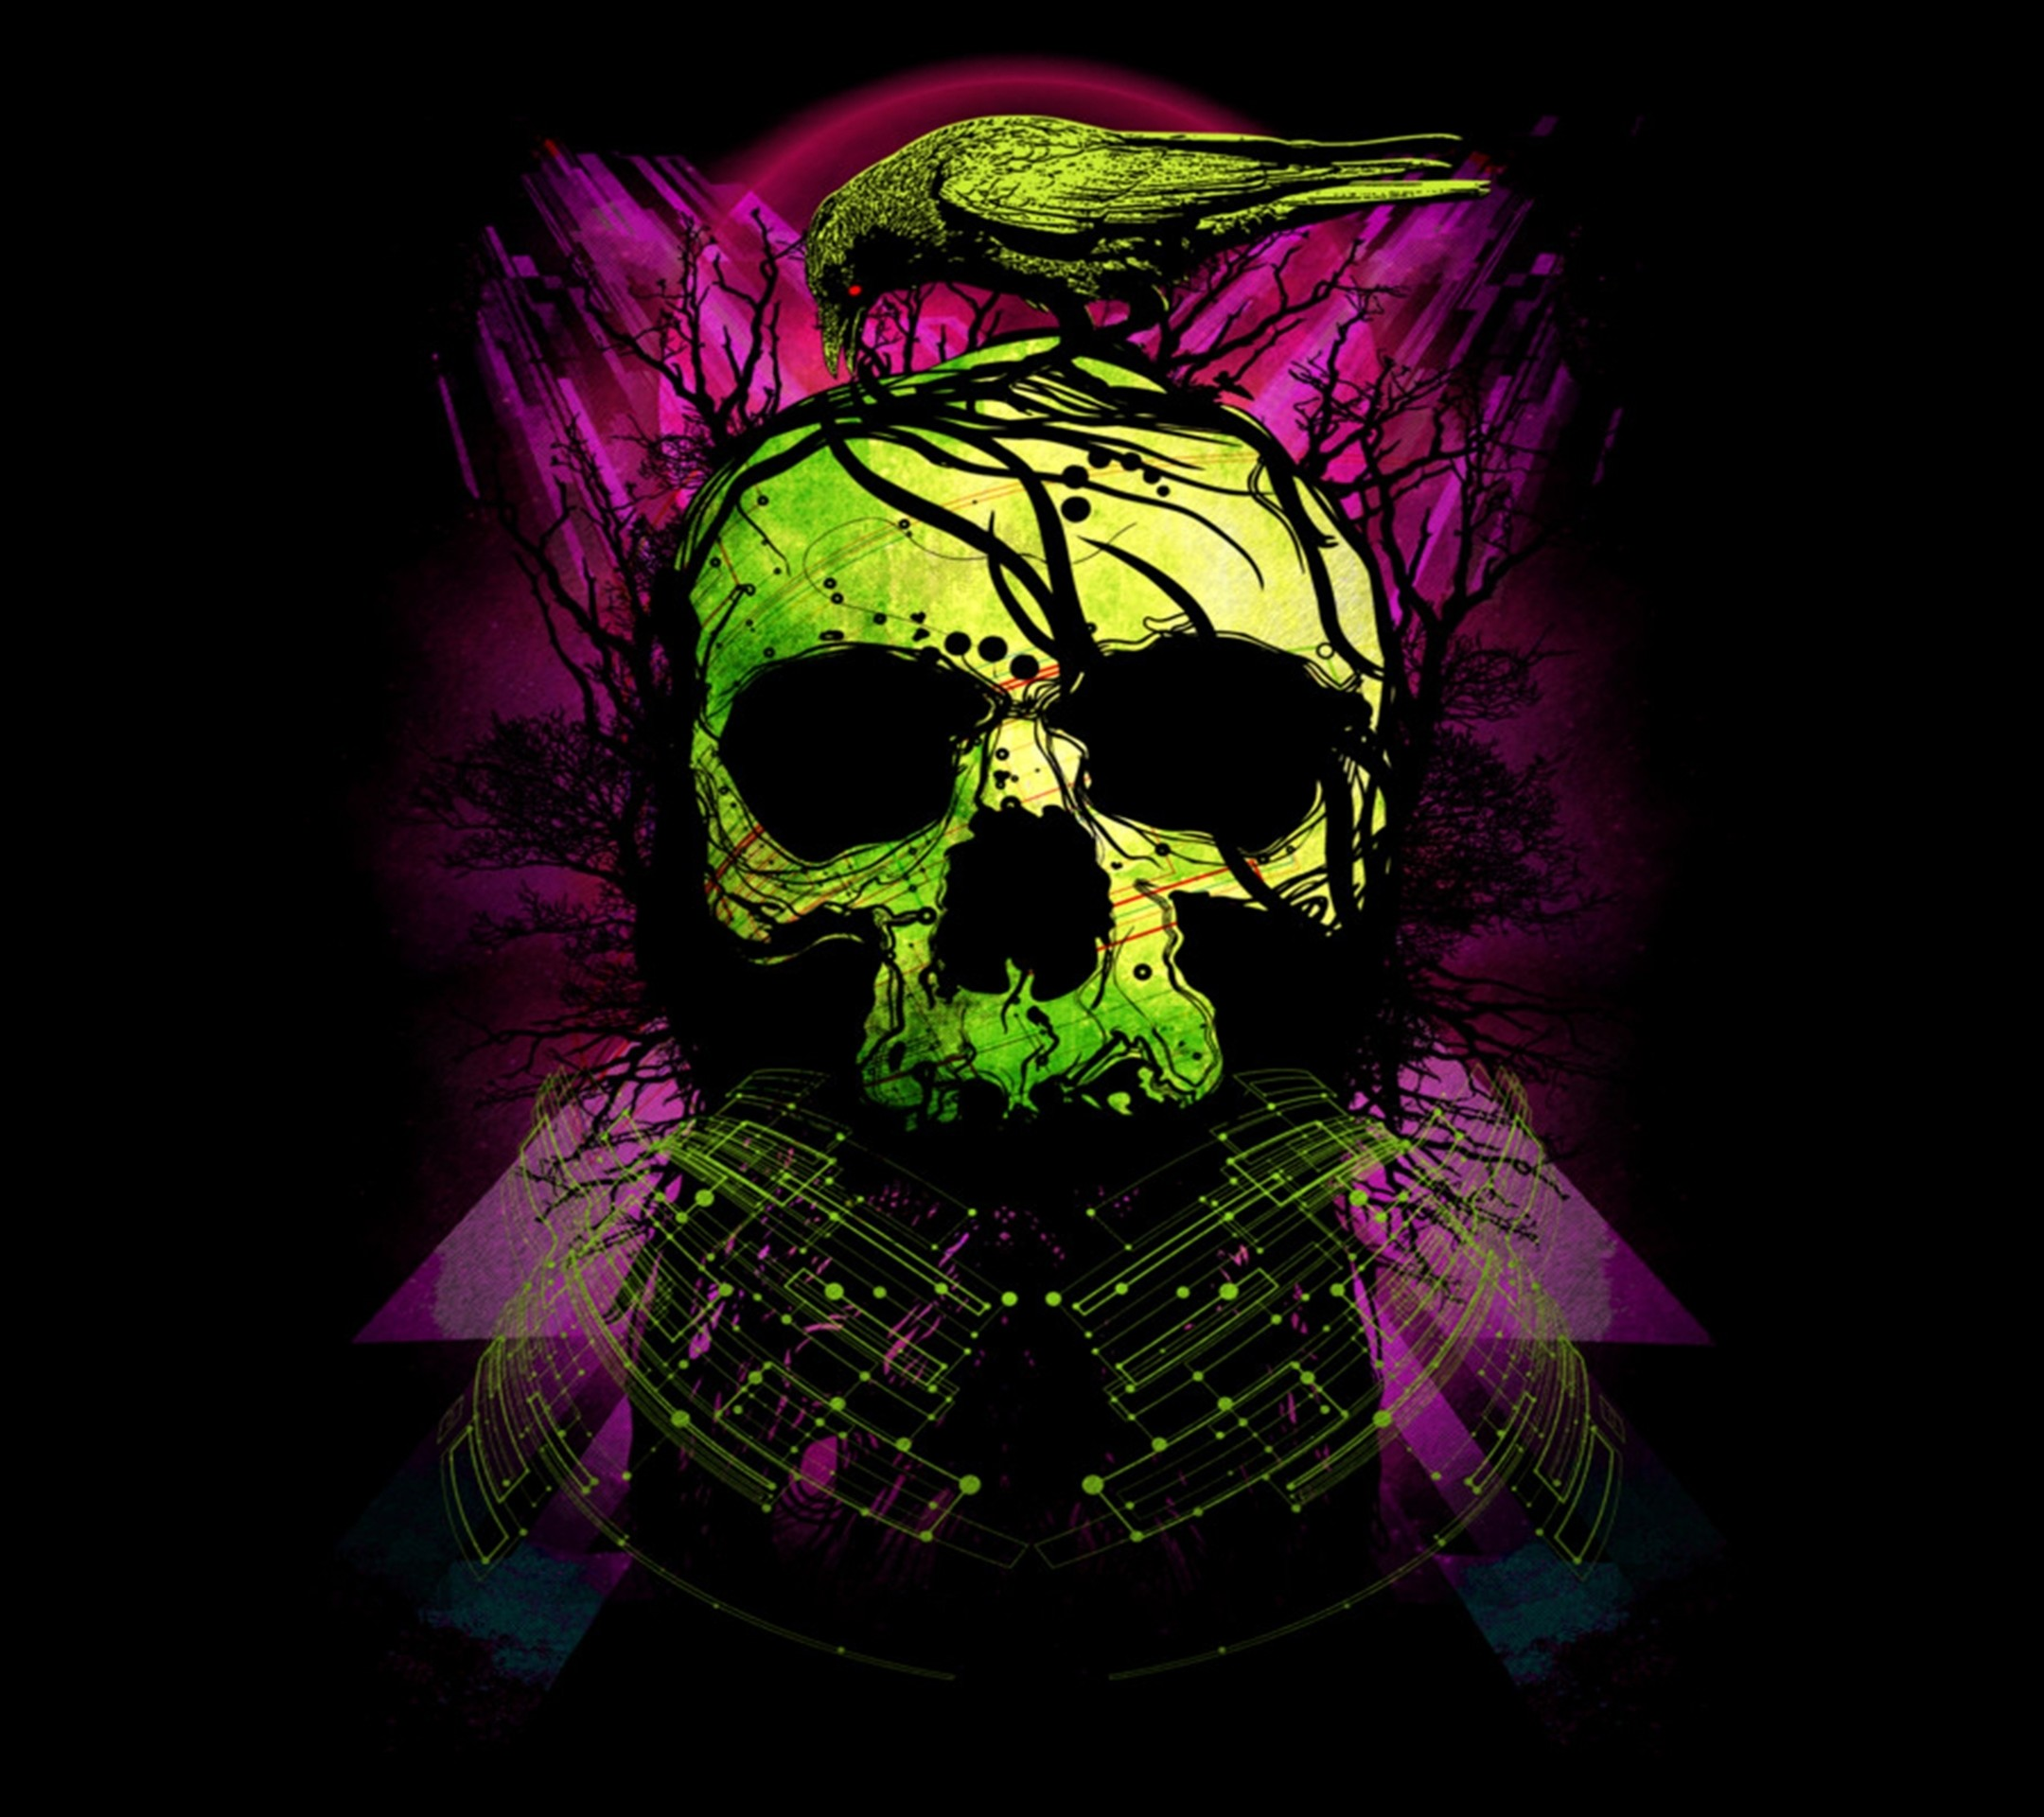 Pink Skull Wallpaper (50+ Images